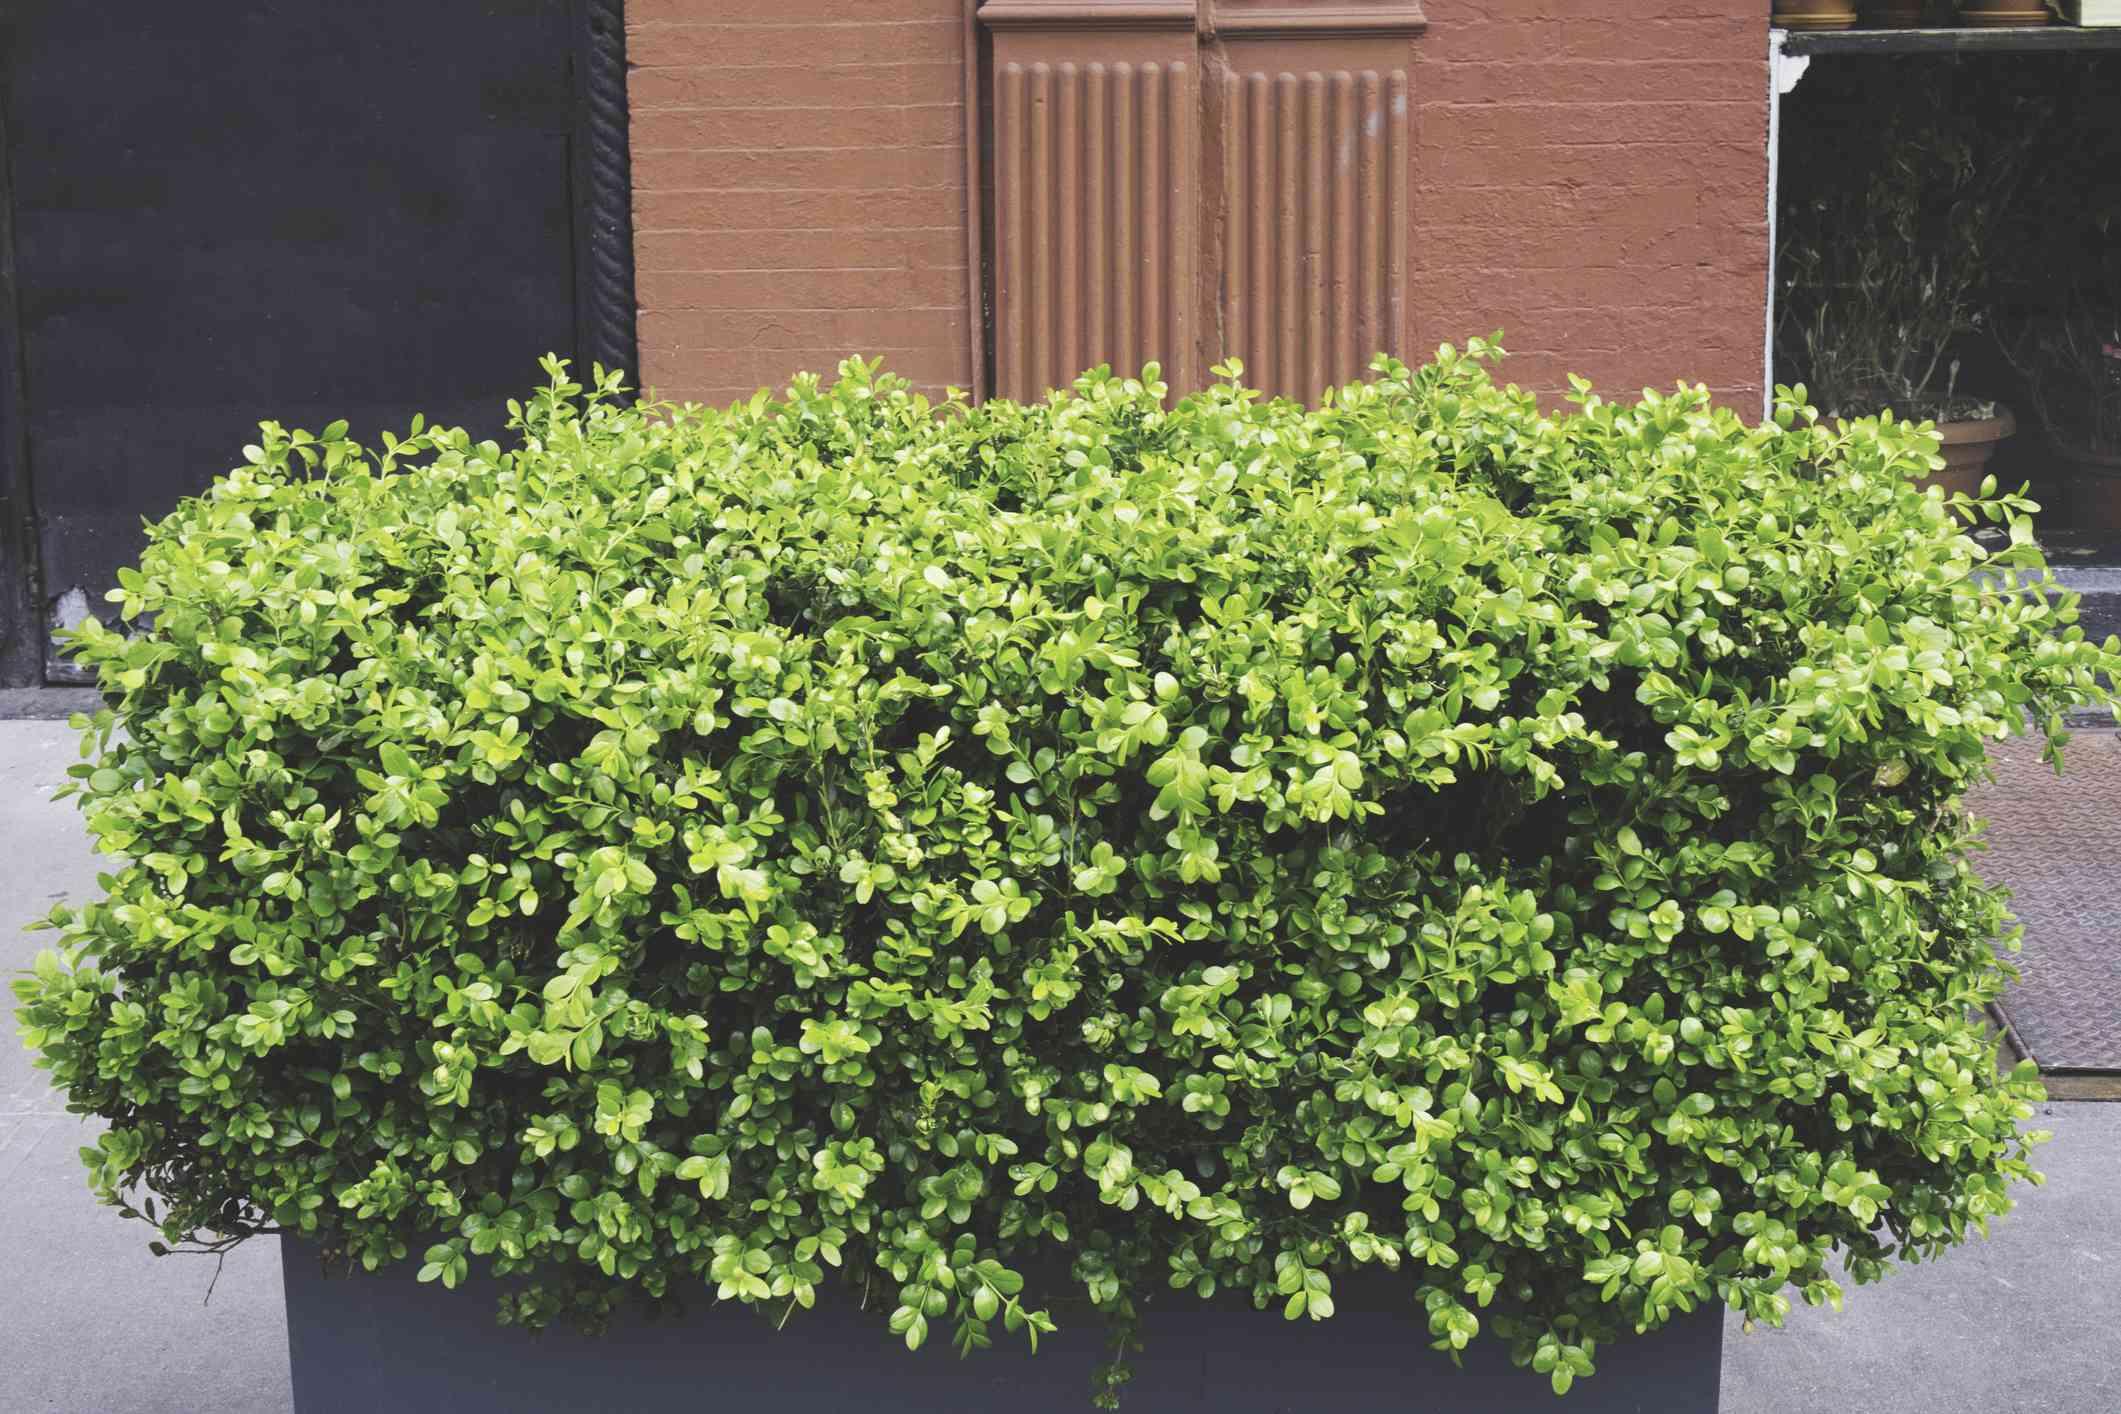 Big green shrub on the sidewalk of new york city